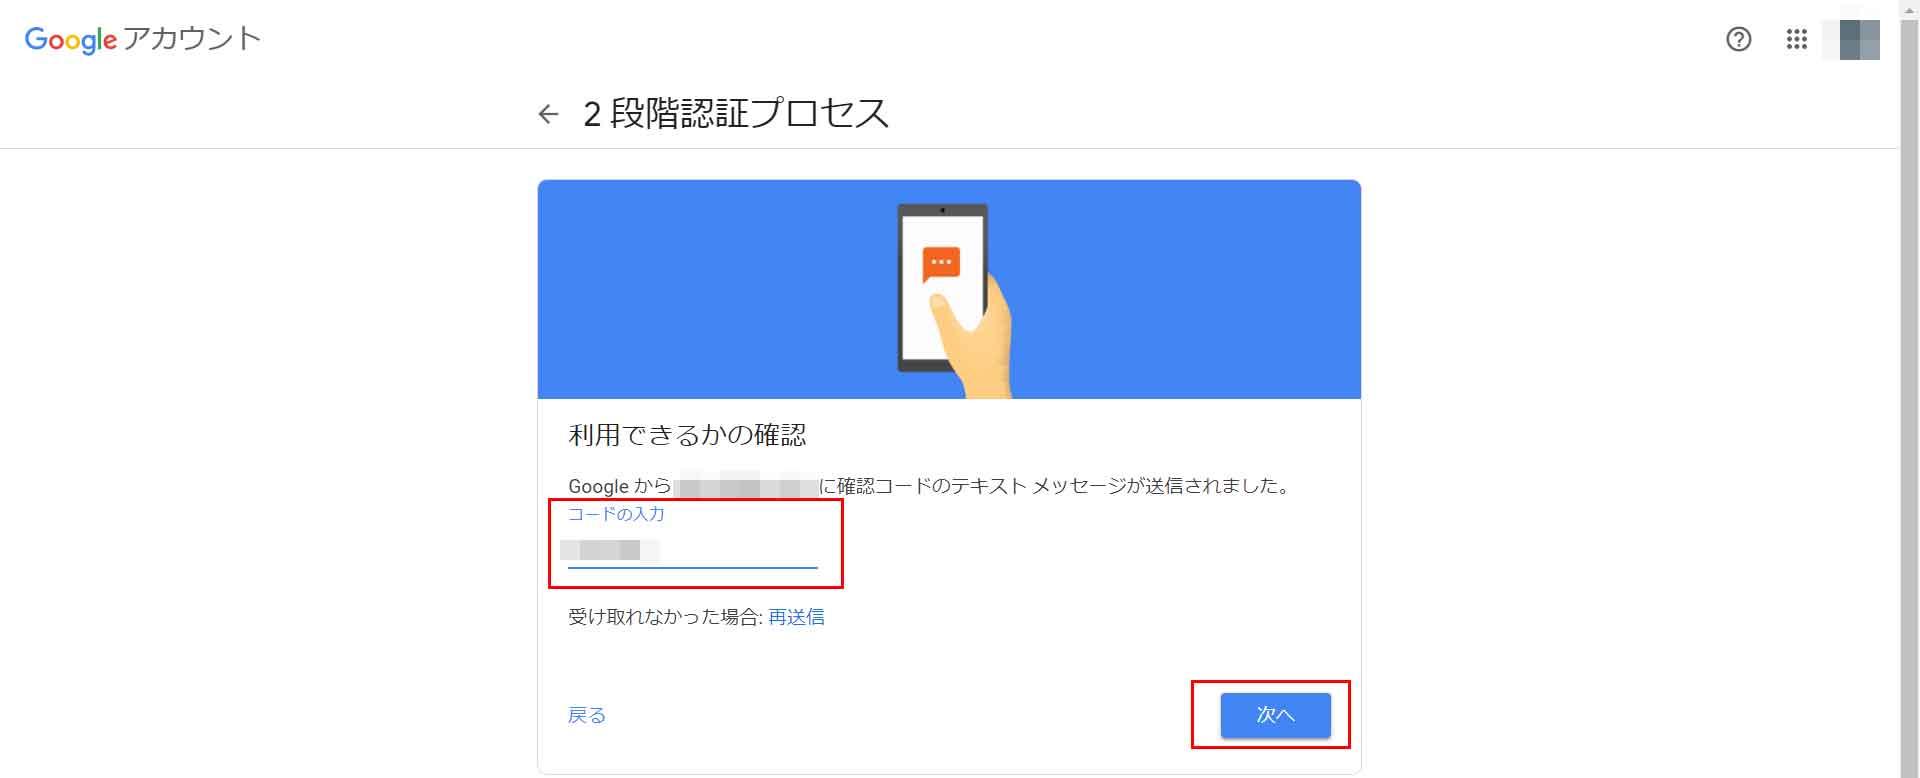 Google確認コードを入力する